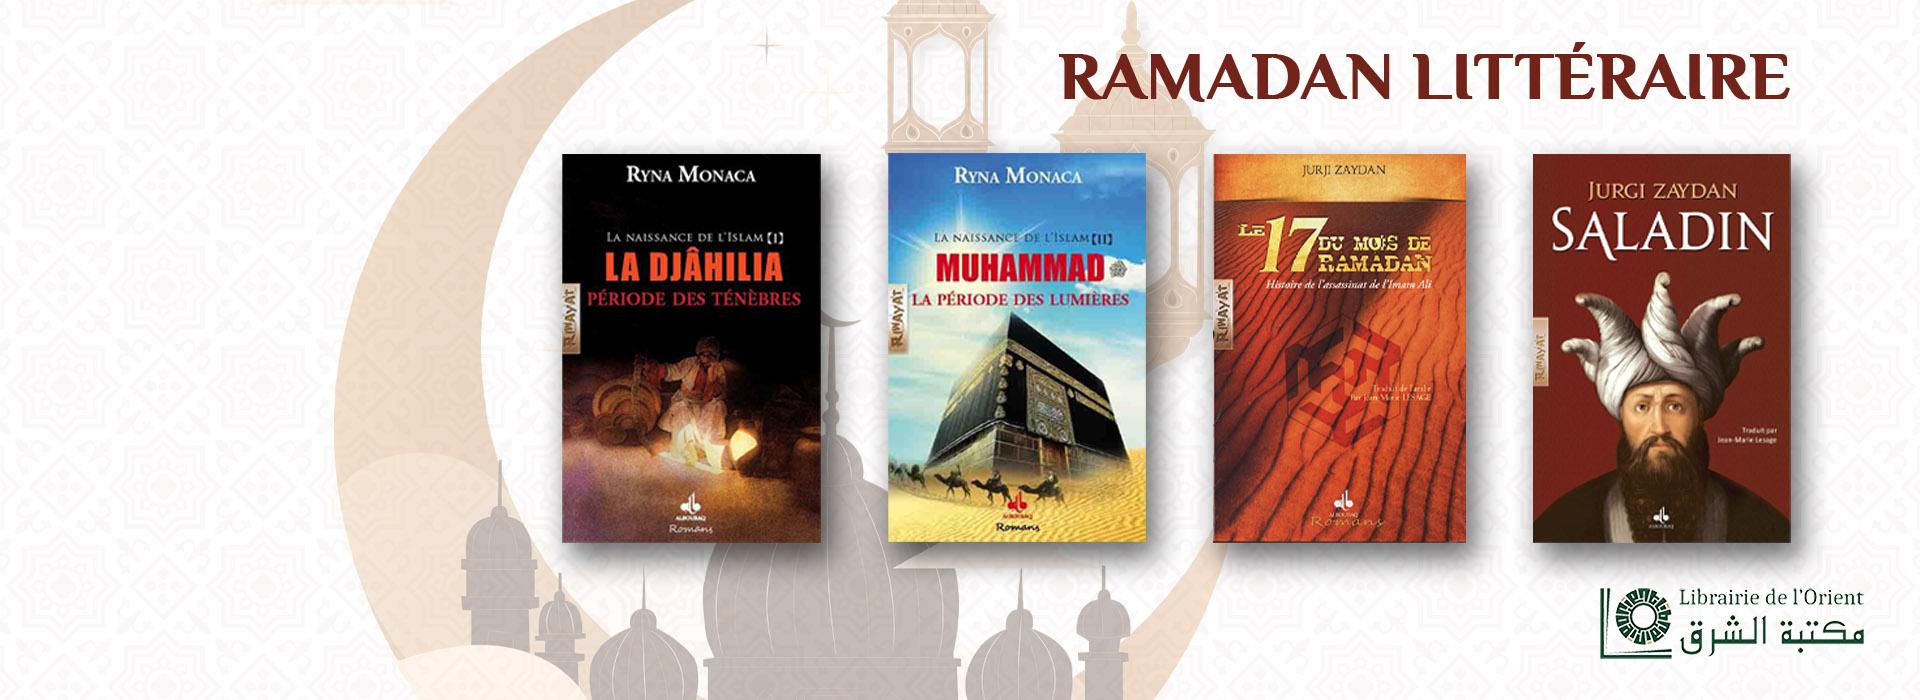 ramadan littéraire